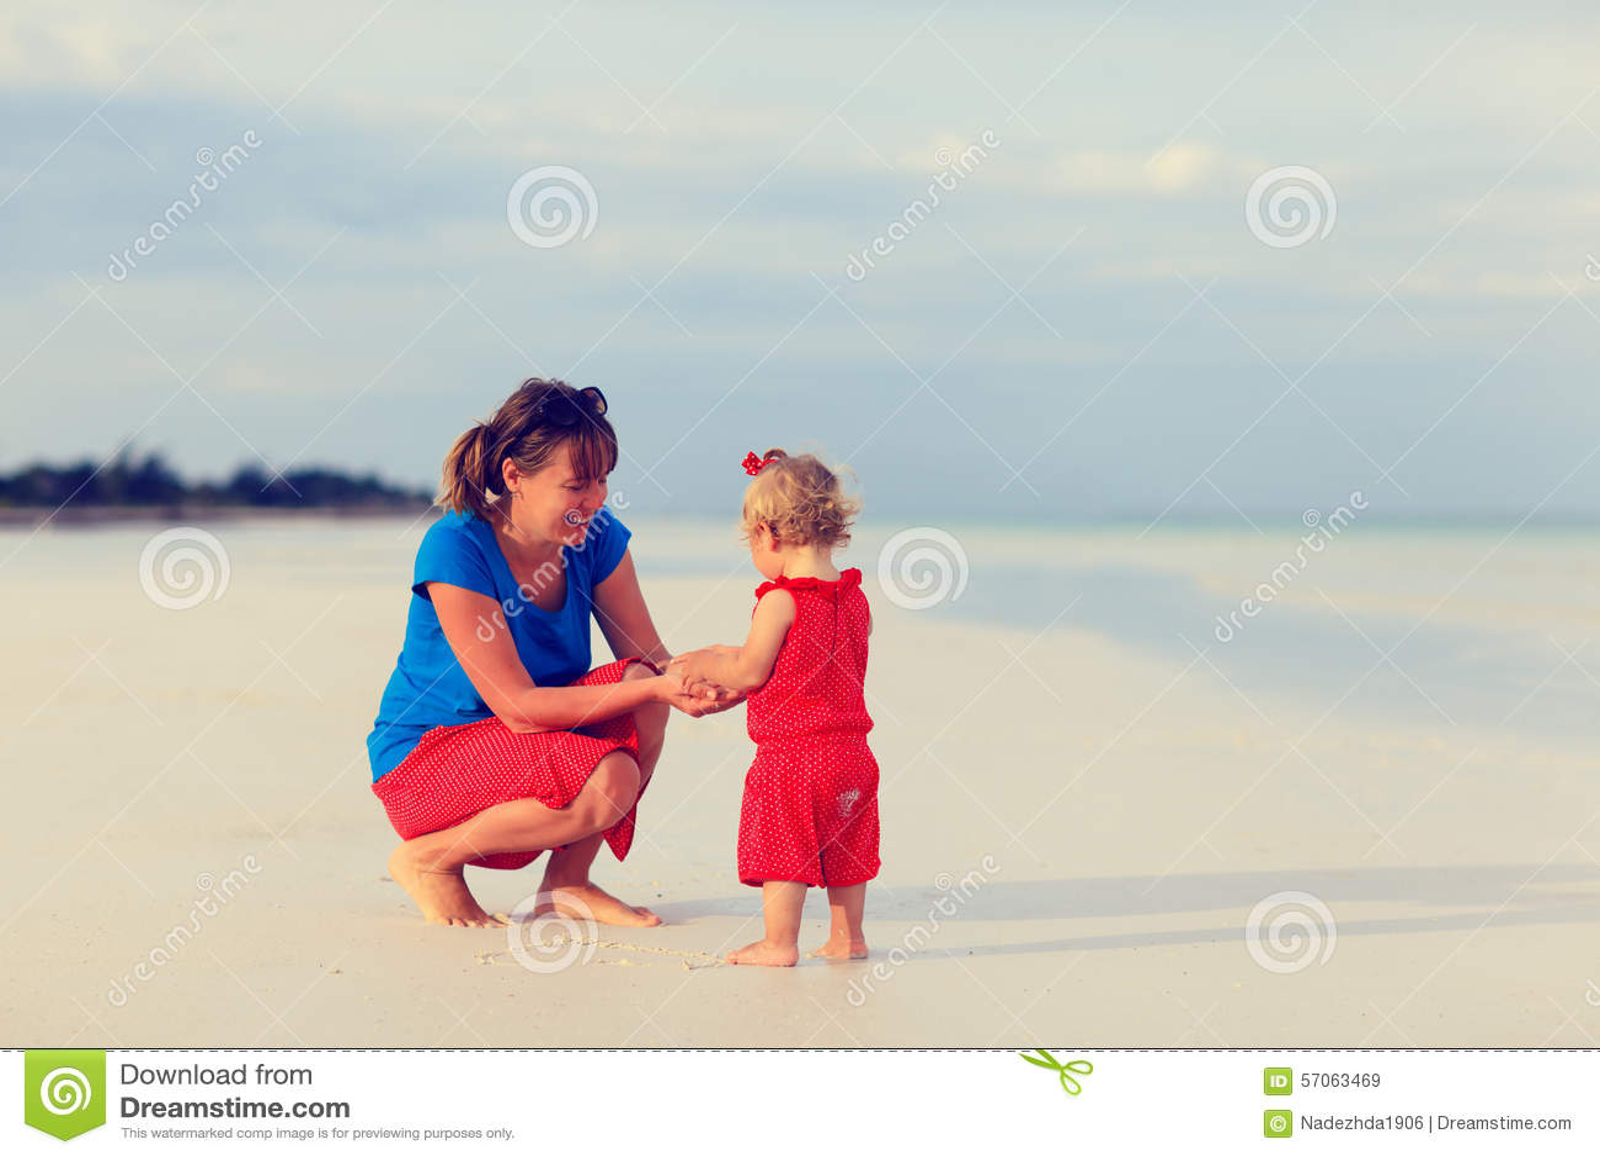 Moeder en weinig dochter op de zomerstrand